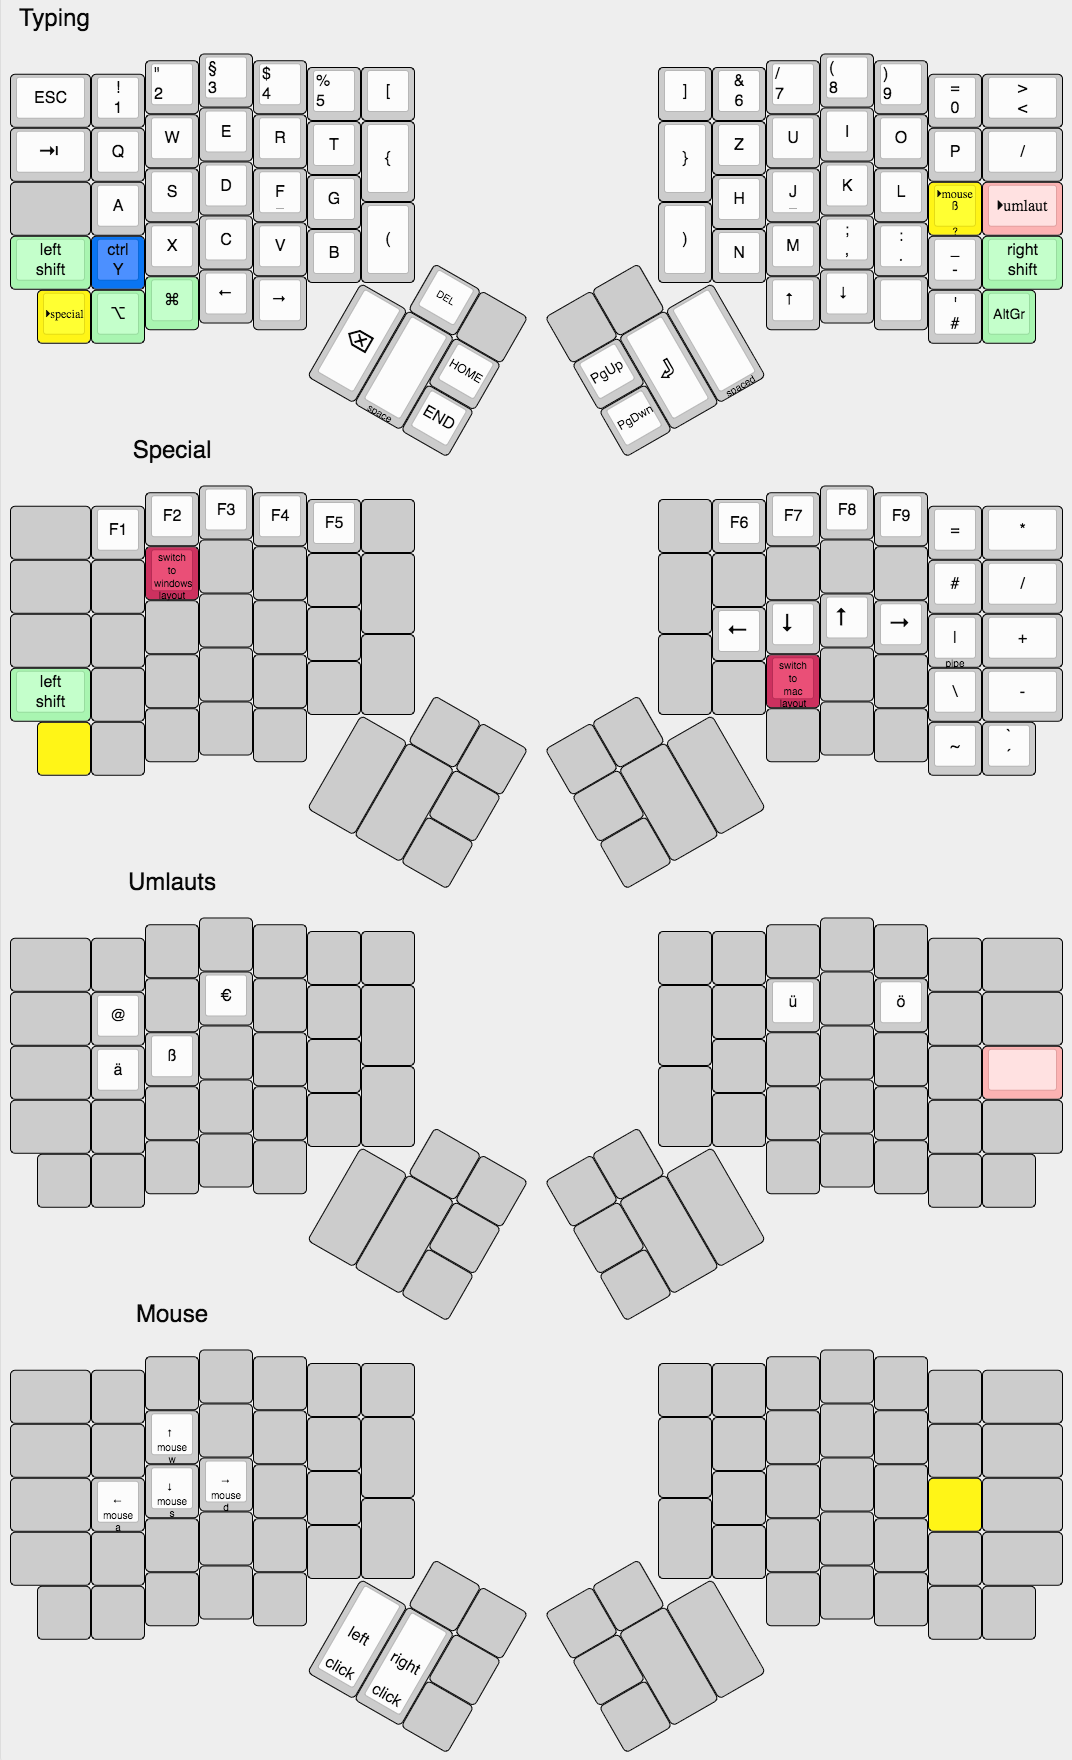 Add layout for ergodox_ez with mac/german setting by neuhalje · Pull